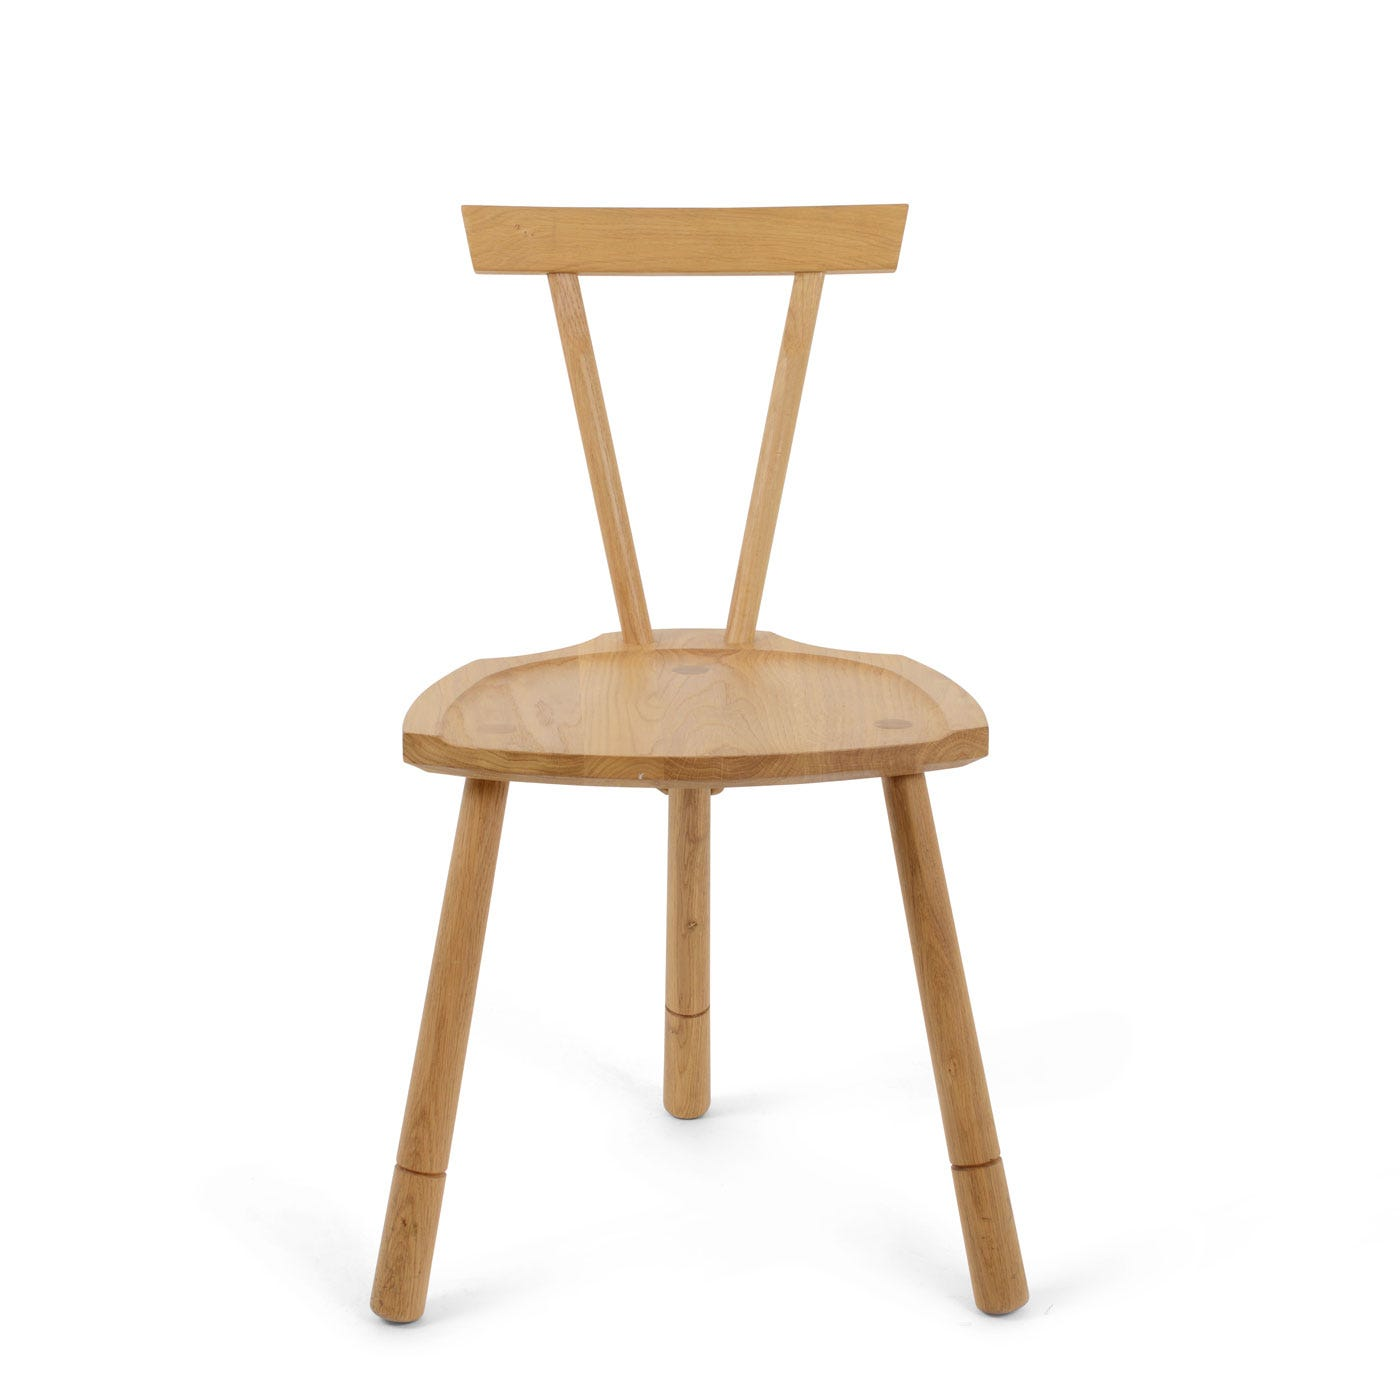 Whitstable 3 Legged Chair